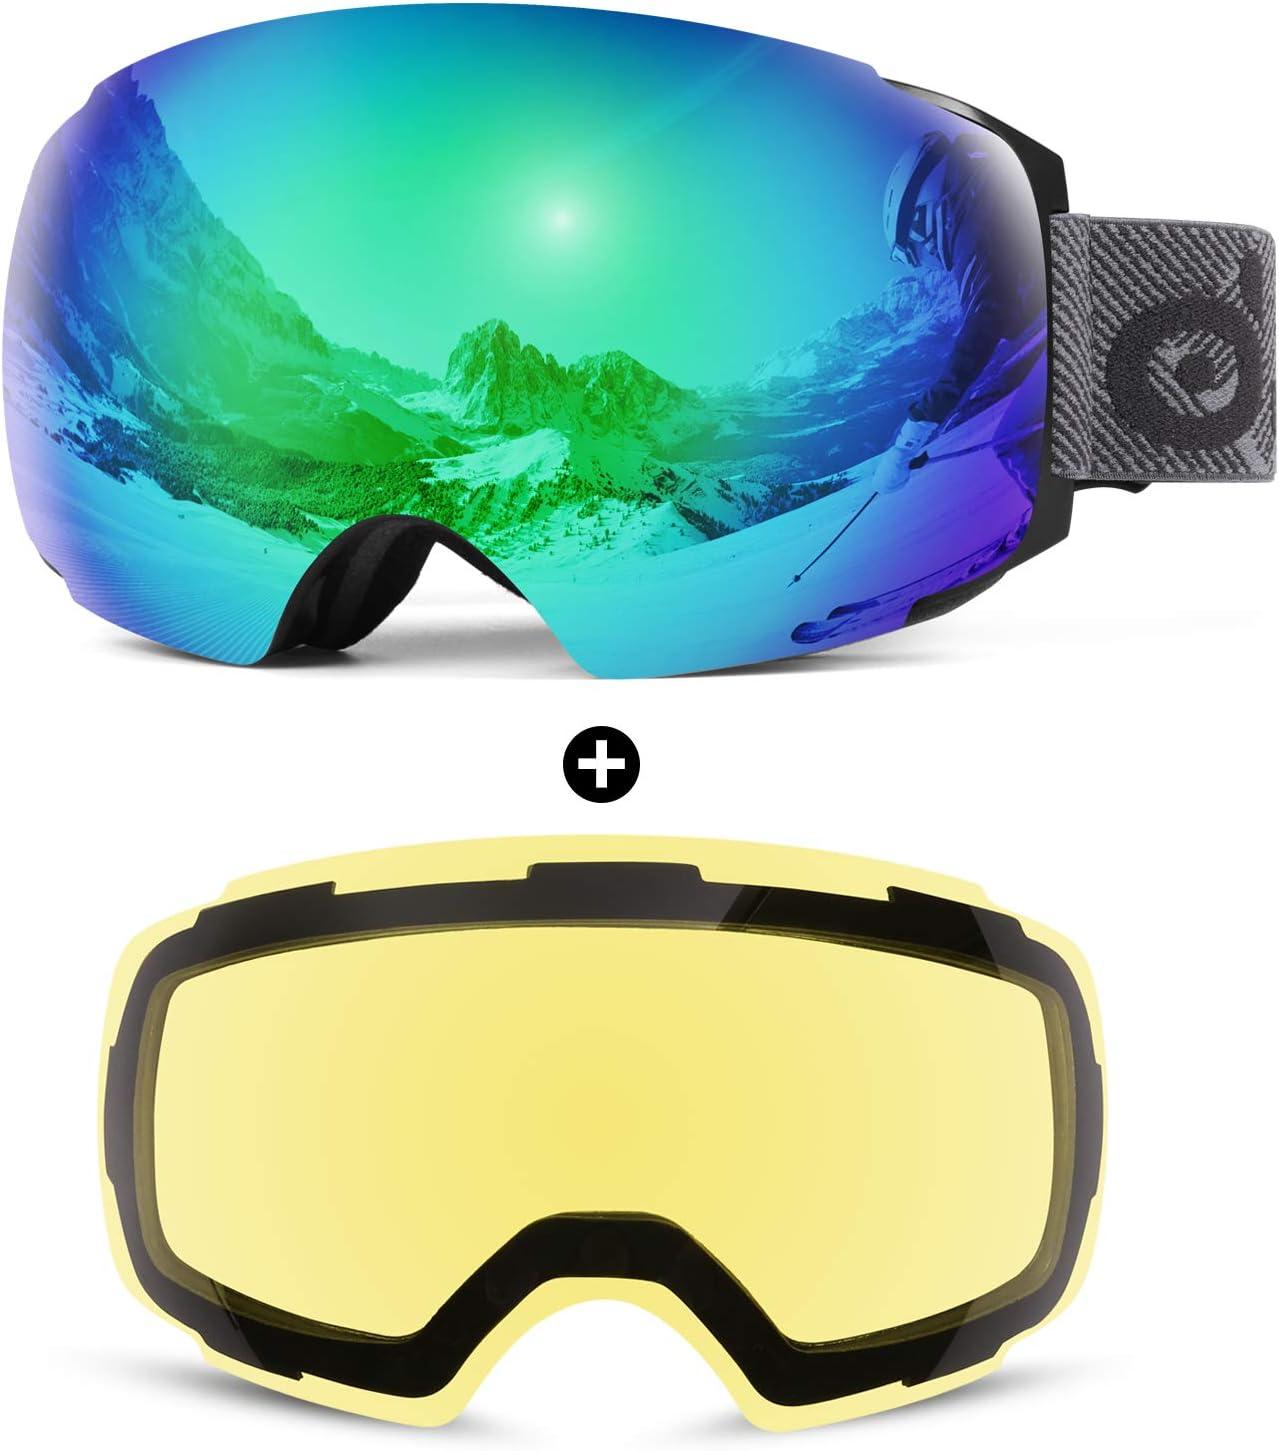 Odoland Magnetic Interchangeable Ski Goggles with 2 Lenses, Large Spherical Frameless Snow Goggles